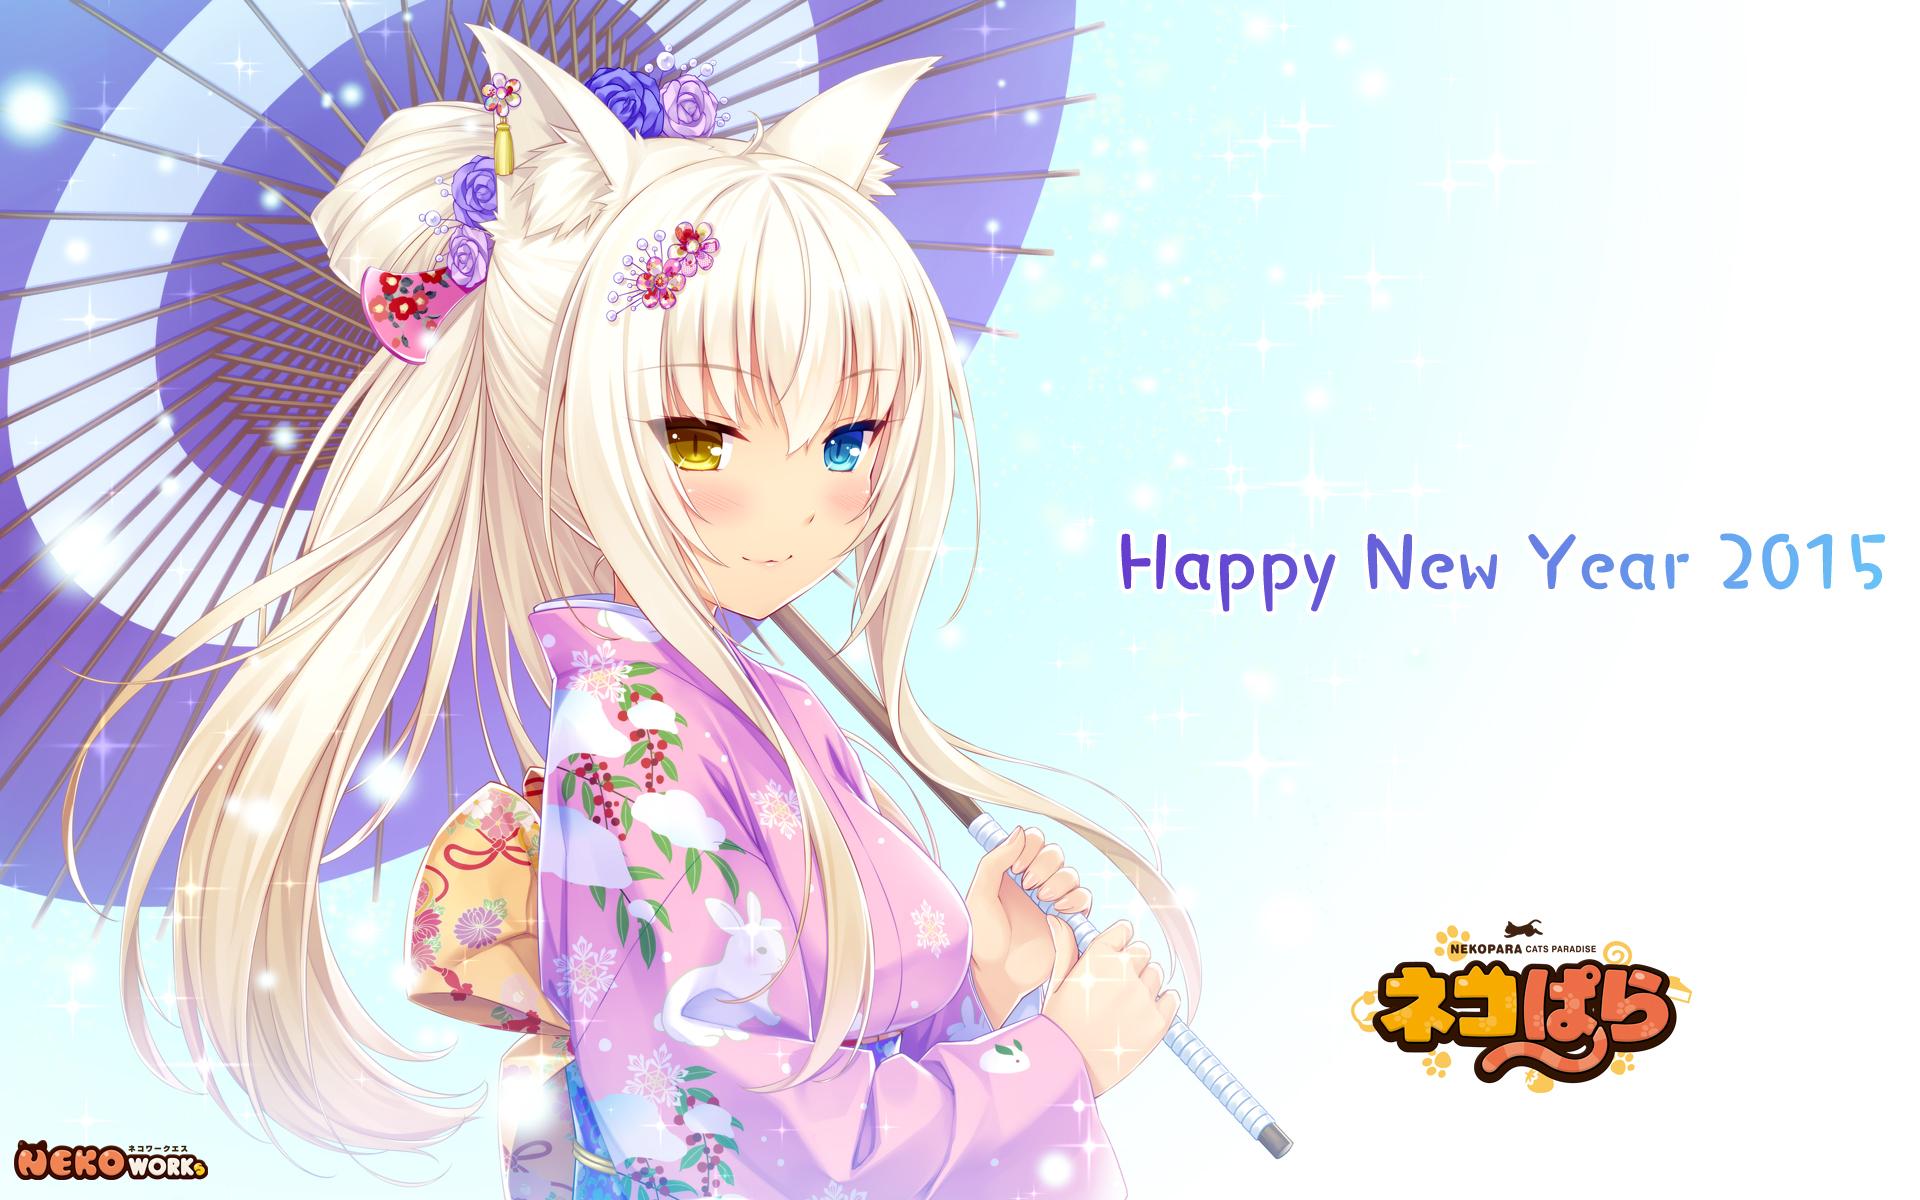 NEKOPARA New Year Wallpaper Illustration haruhichan.com Sekai Project NEKOPARA